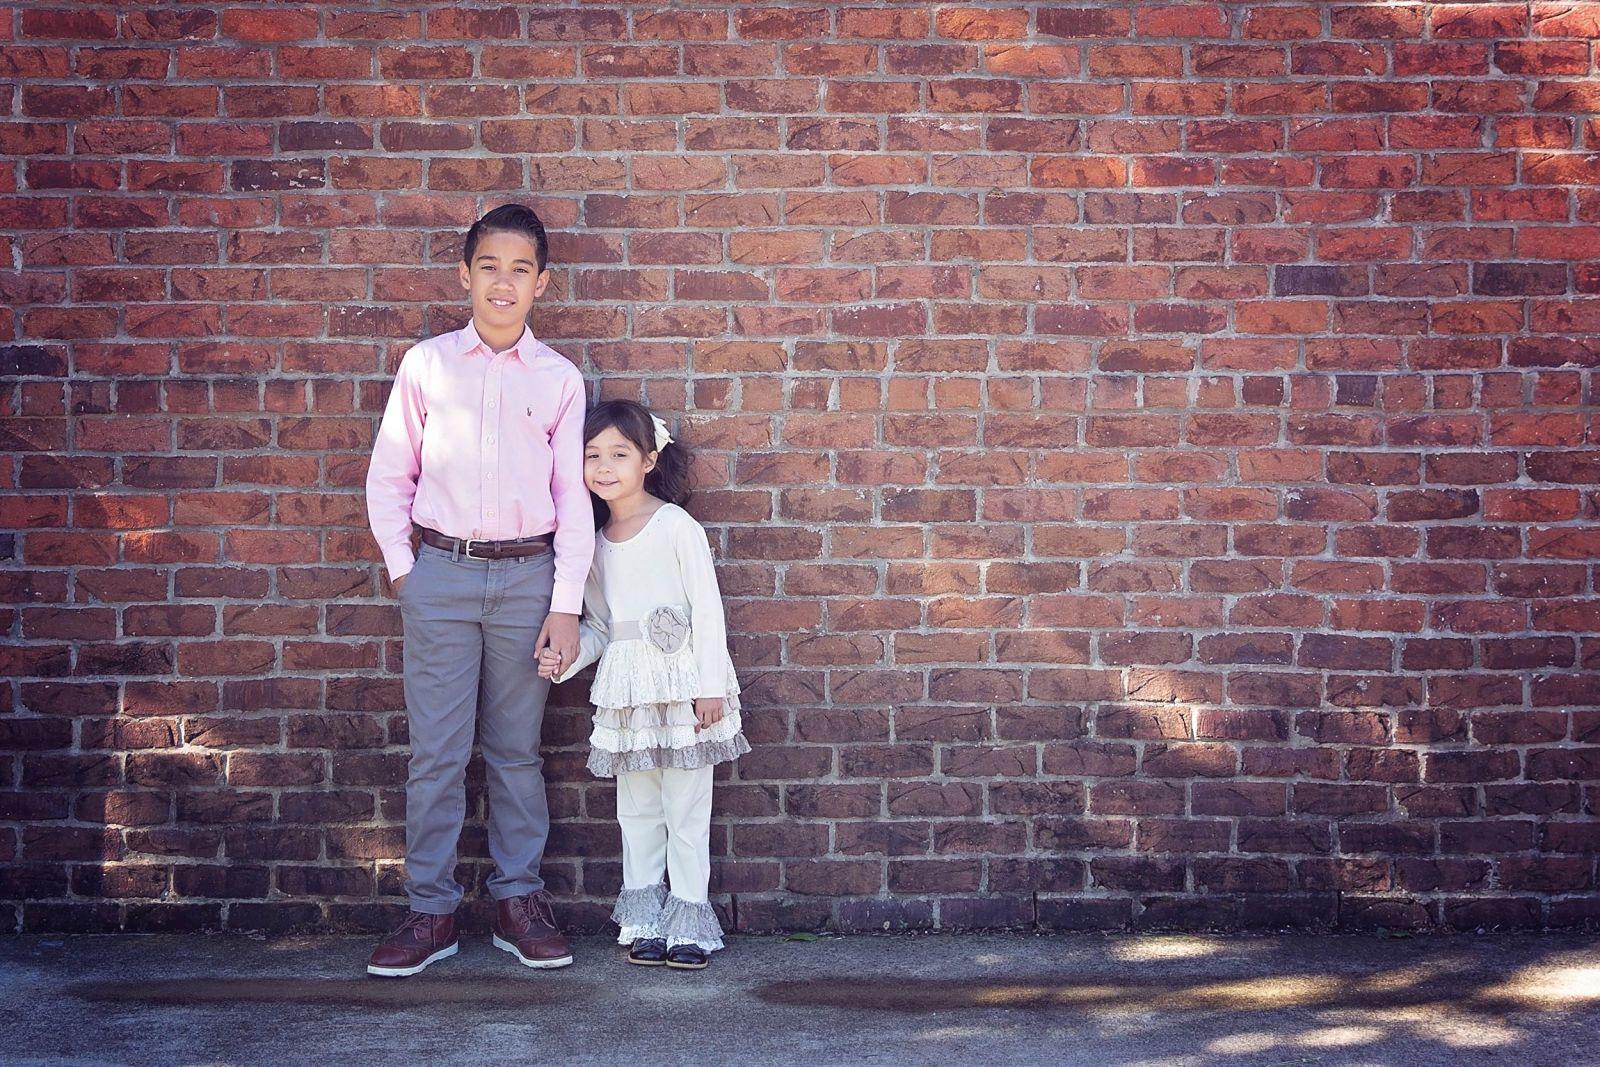 Flower Mound Family Photographer White Lavender Photography